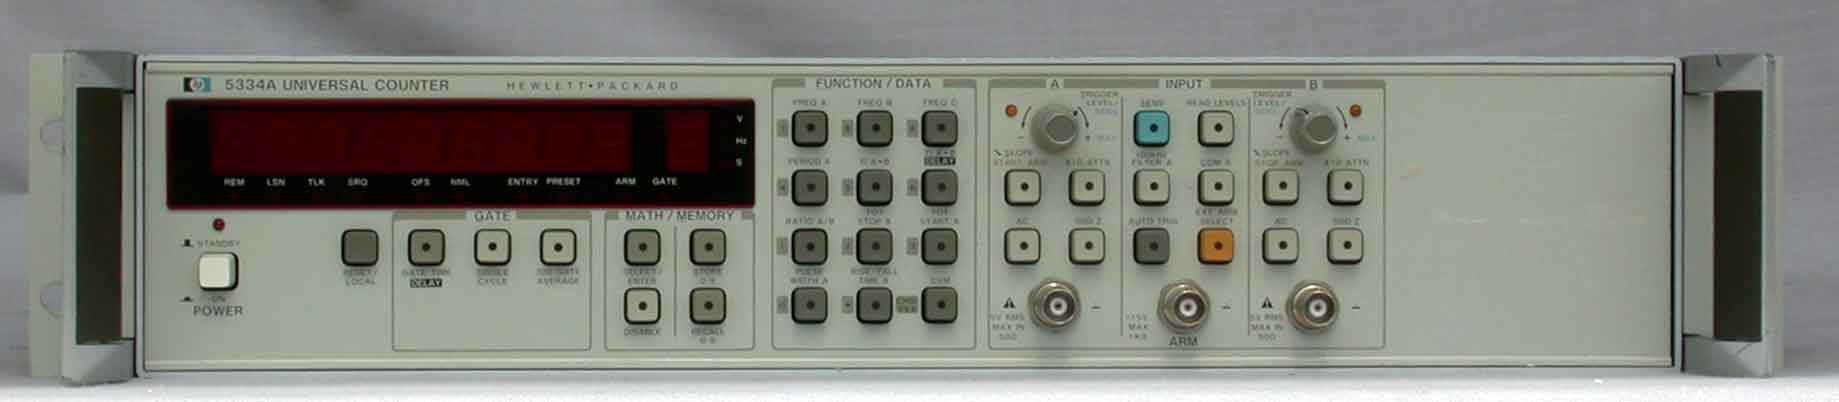 Agilent 5334A